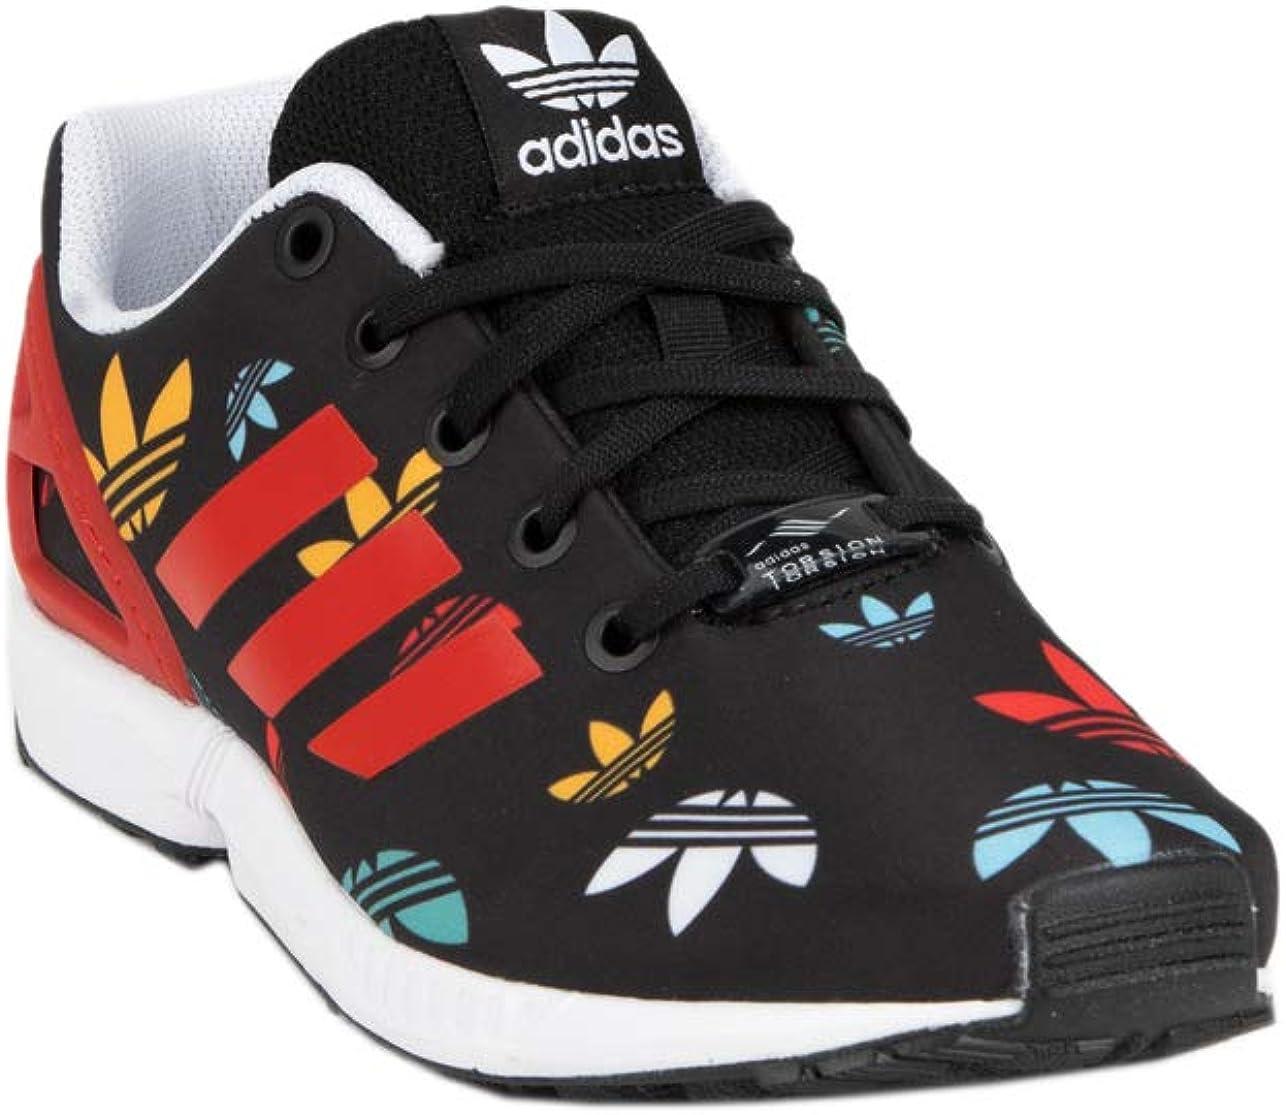 adidas ZX Flux PK Mens Fashion-Sneakers